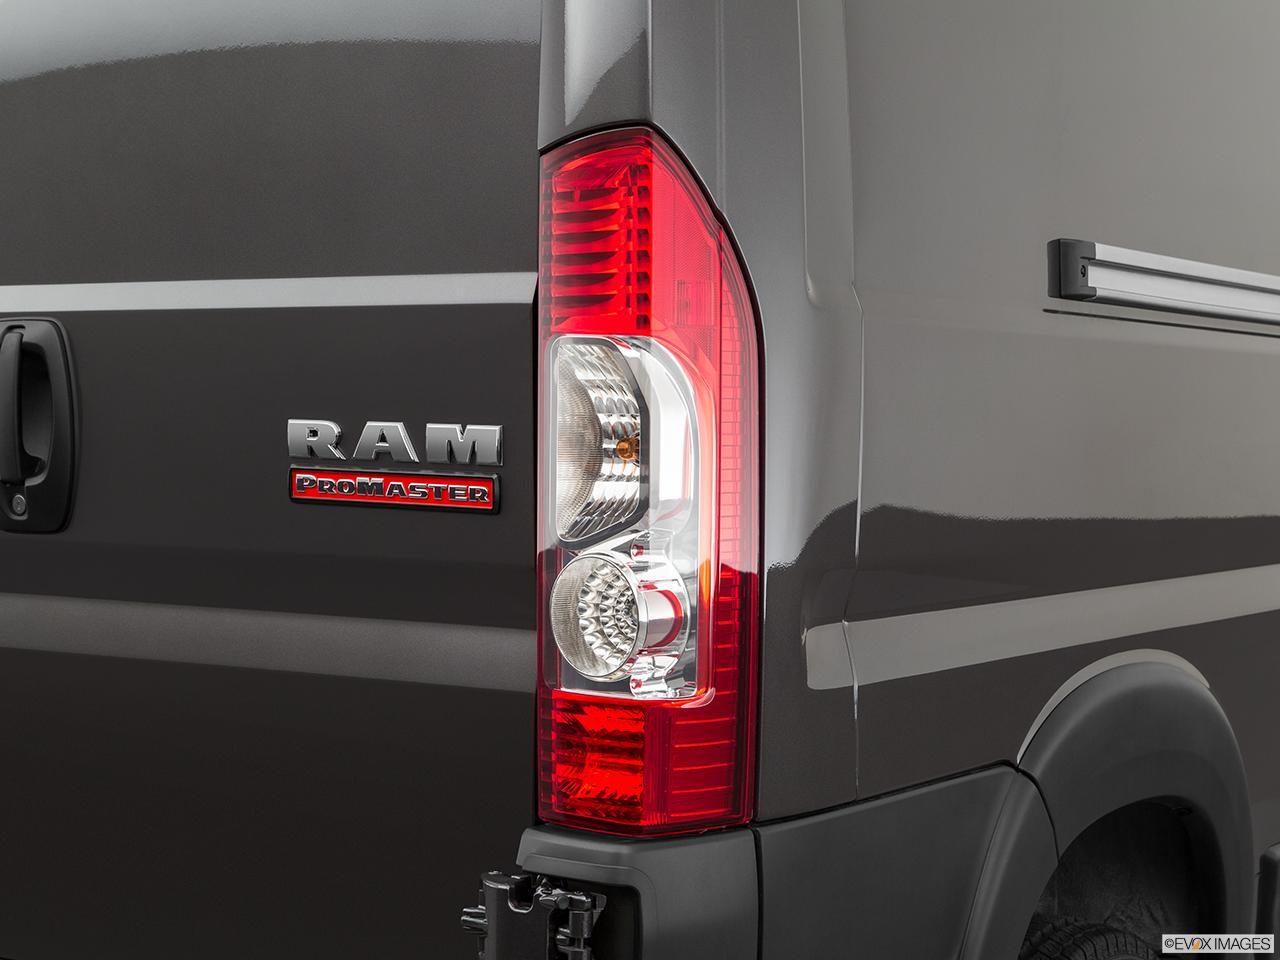 2020 Ram ProMaster Cargo photo